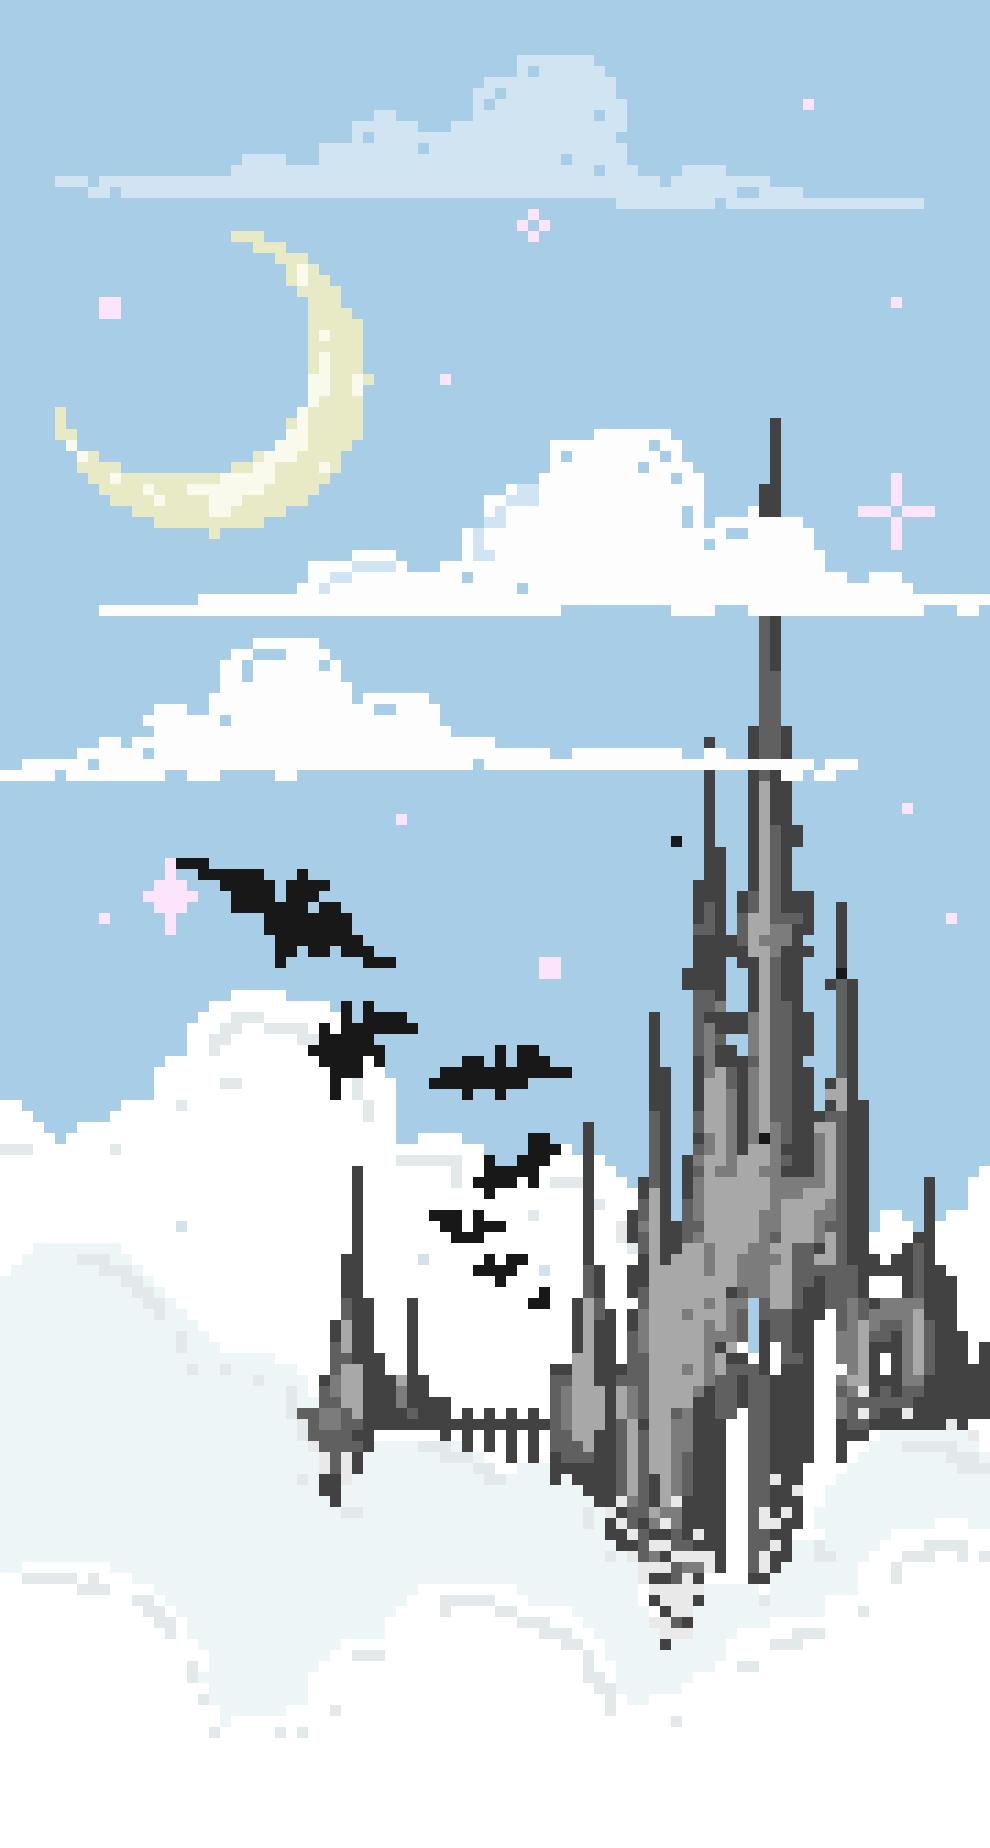 Pastel Pastelgoth Castle Bats Moon Stars Pink Clouds Castlebasas Lilcaste Art Magic Pixelart Pixel Goth Goth Wallpaper Pixel Art Emo Wallpaper